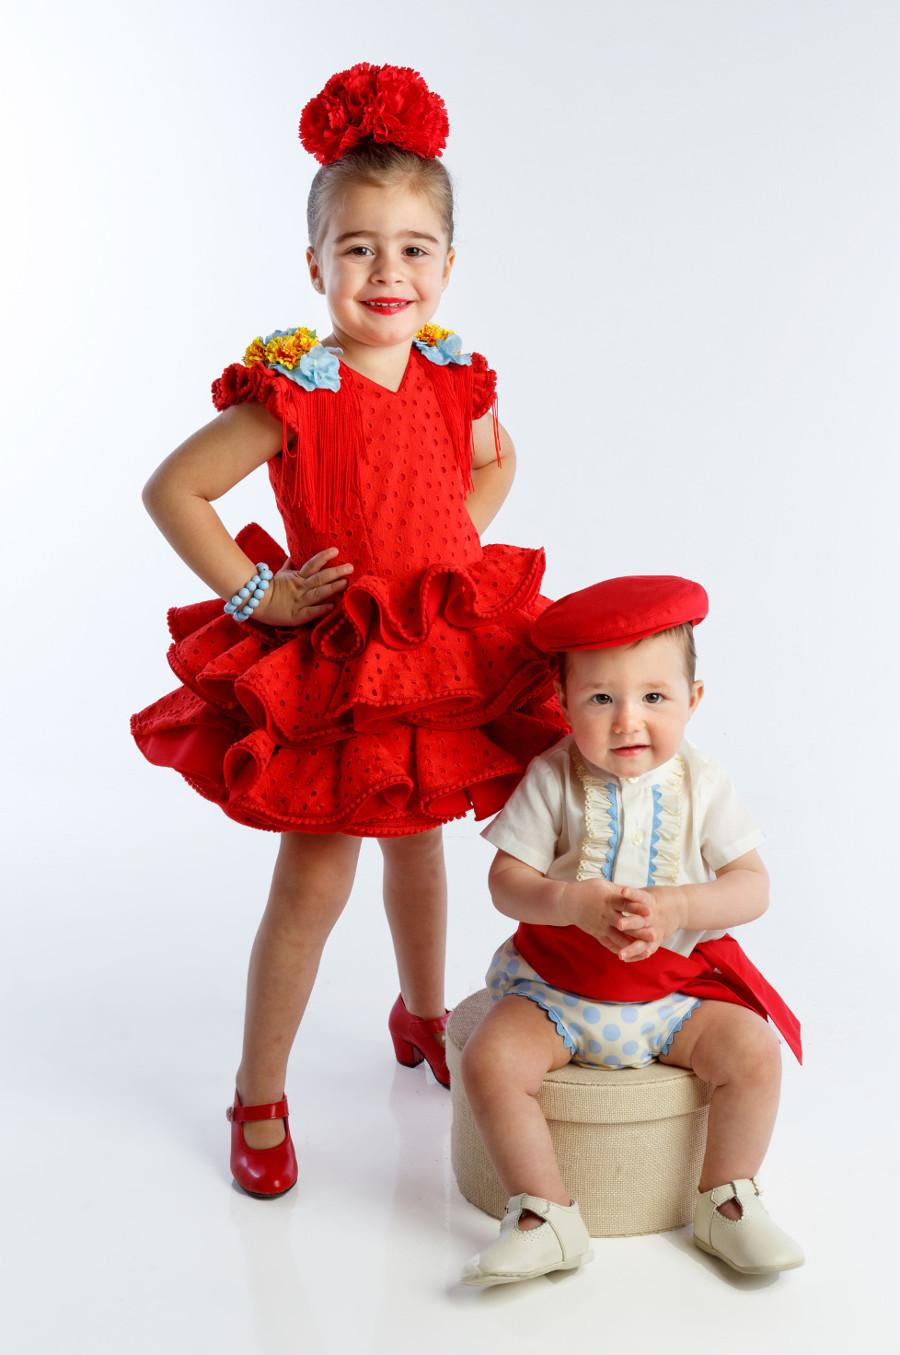 Traje de gitana a juego niño y niña perforado rojo colección 2019 mibebesito